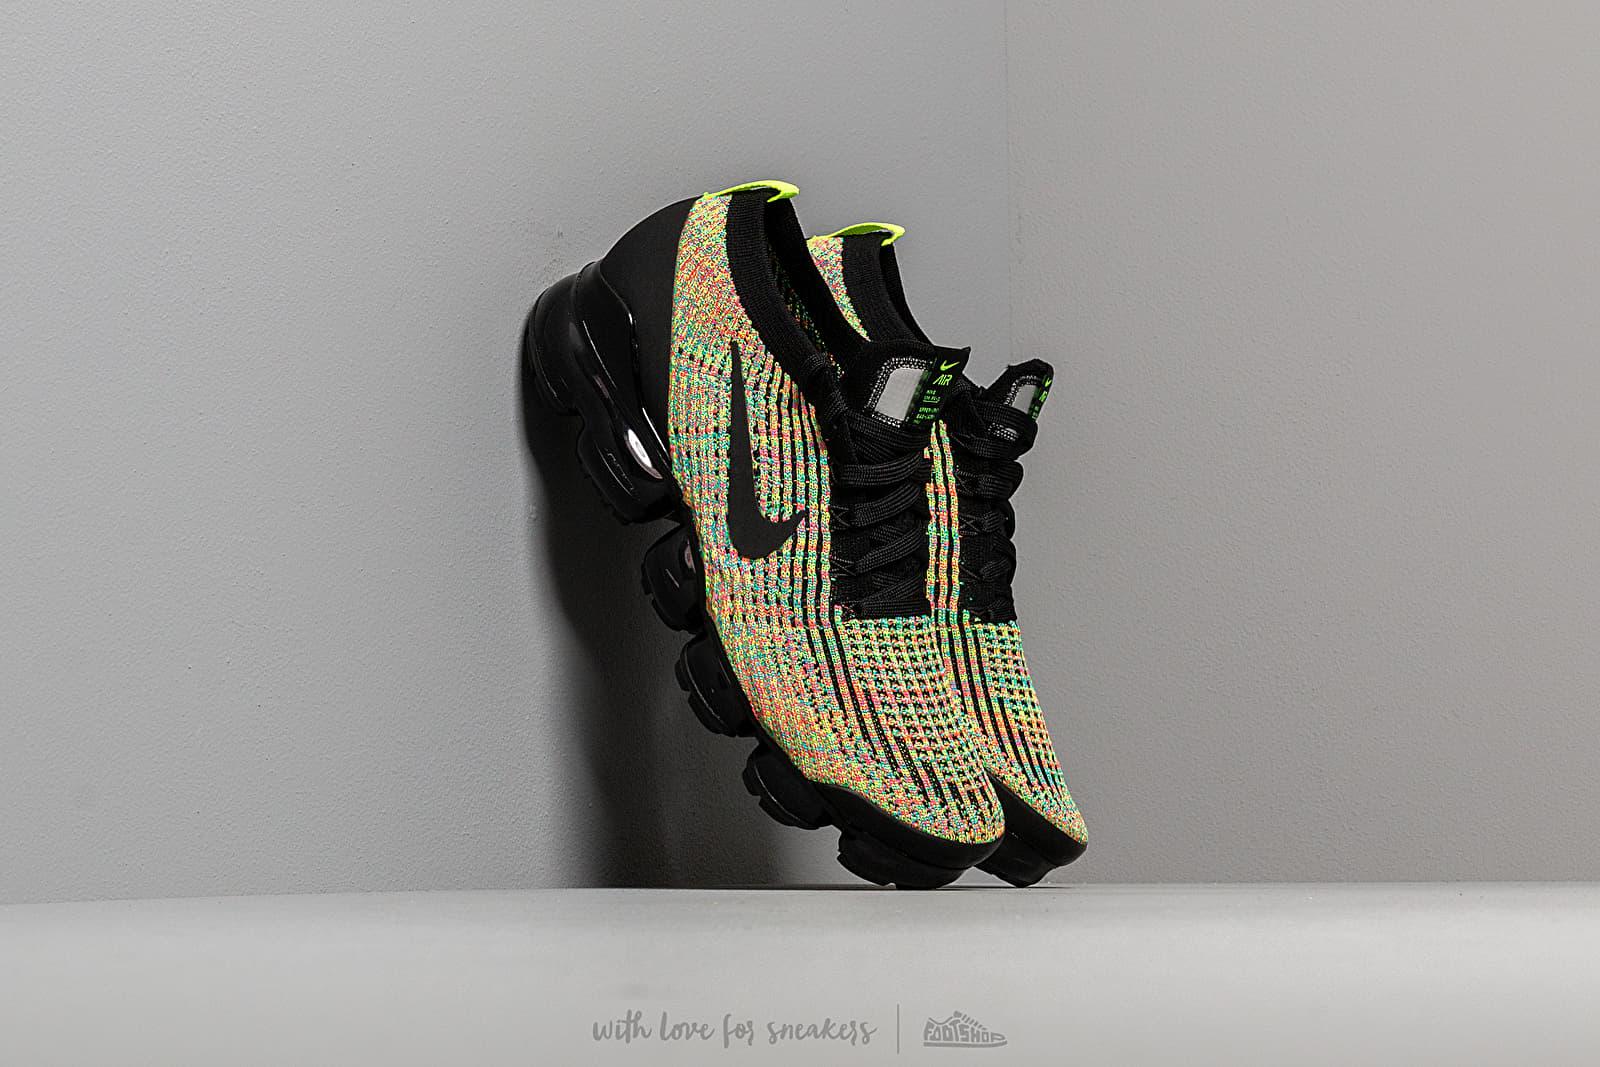 Nike Air Vapormax Flyknit 3 Black/ Black-Volt-Blue Lagoon W super cenie 913 zł kupuj na Footshop.pl